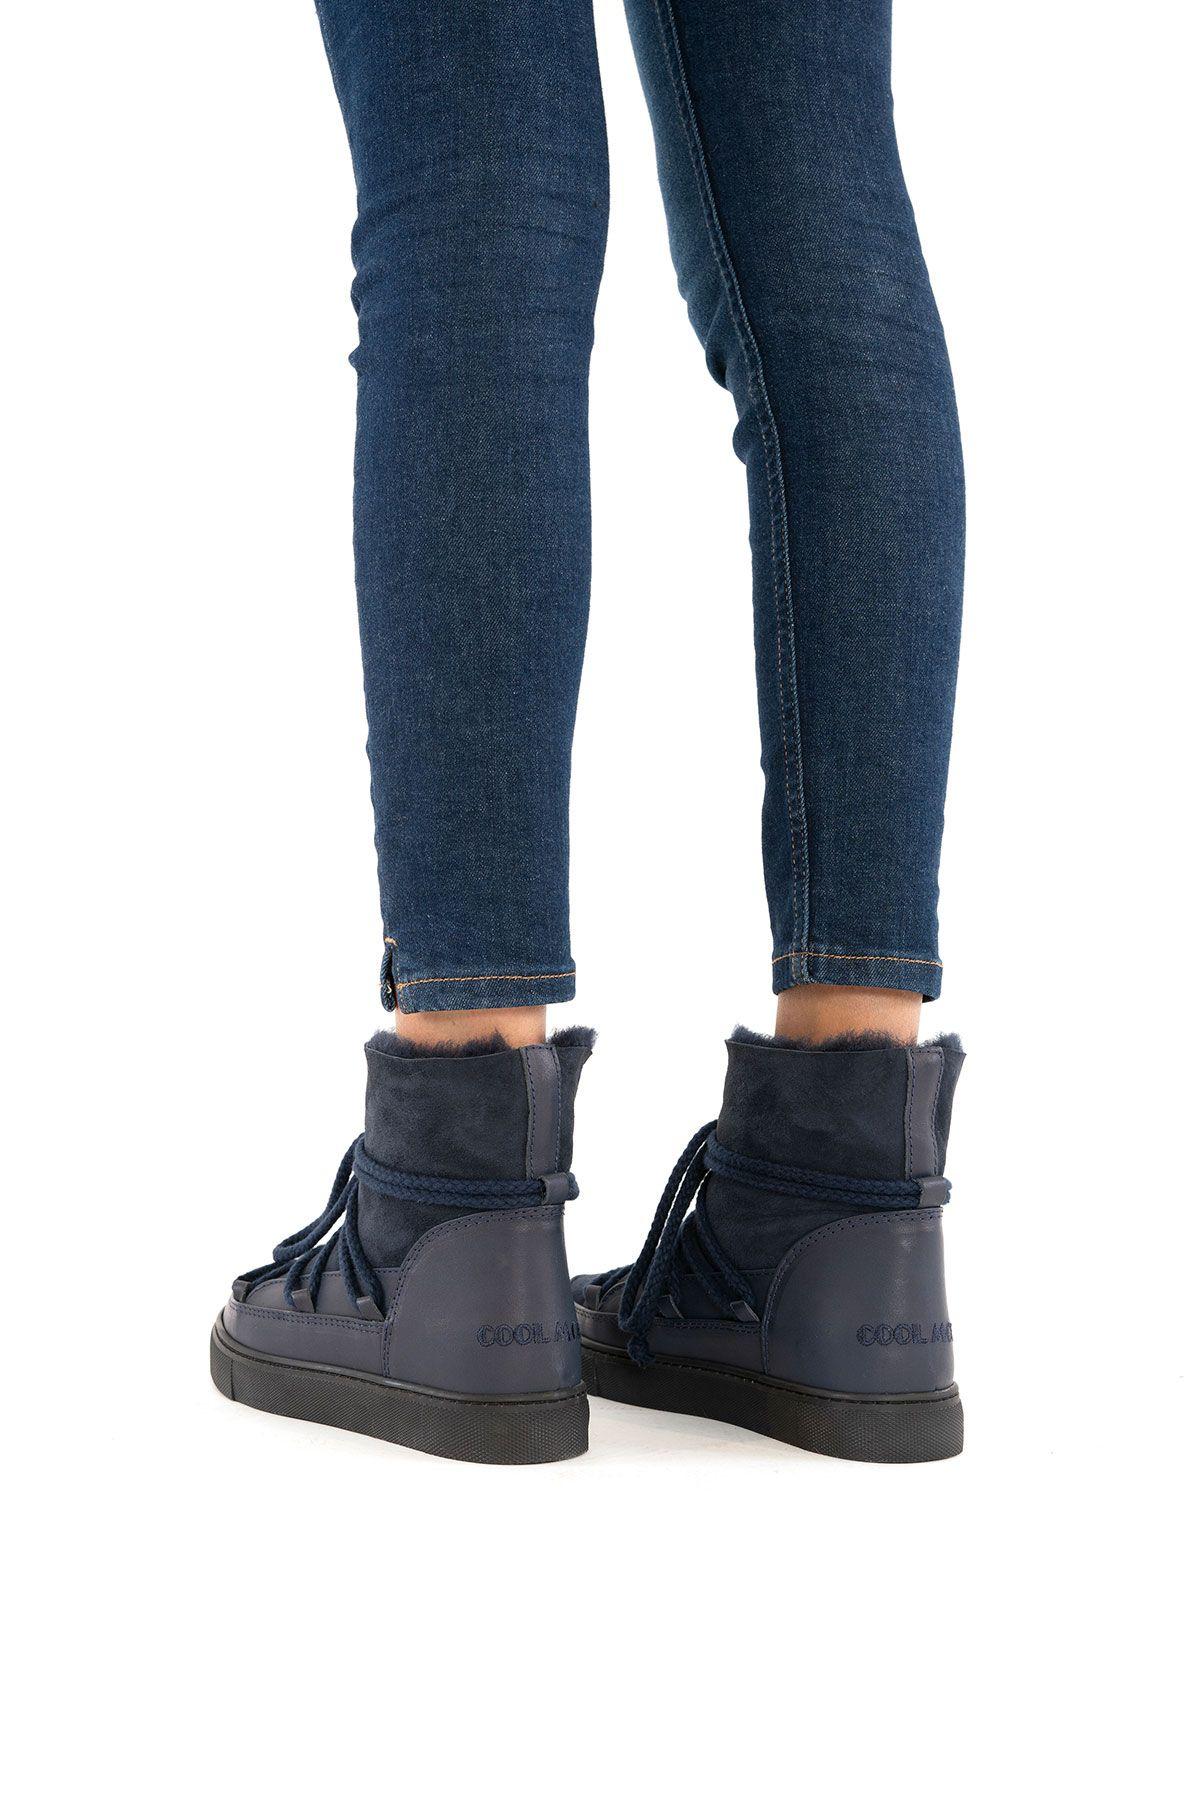 Cool Moon Hakiki İçi Kürk Bayan Sneaker 355050 Lacivert